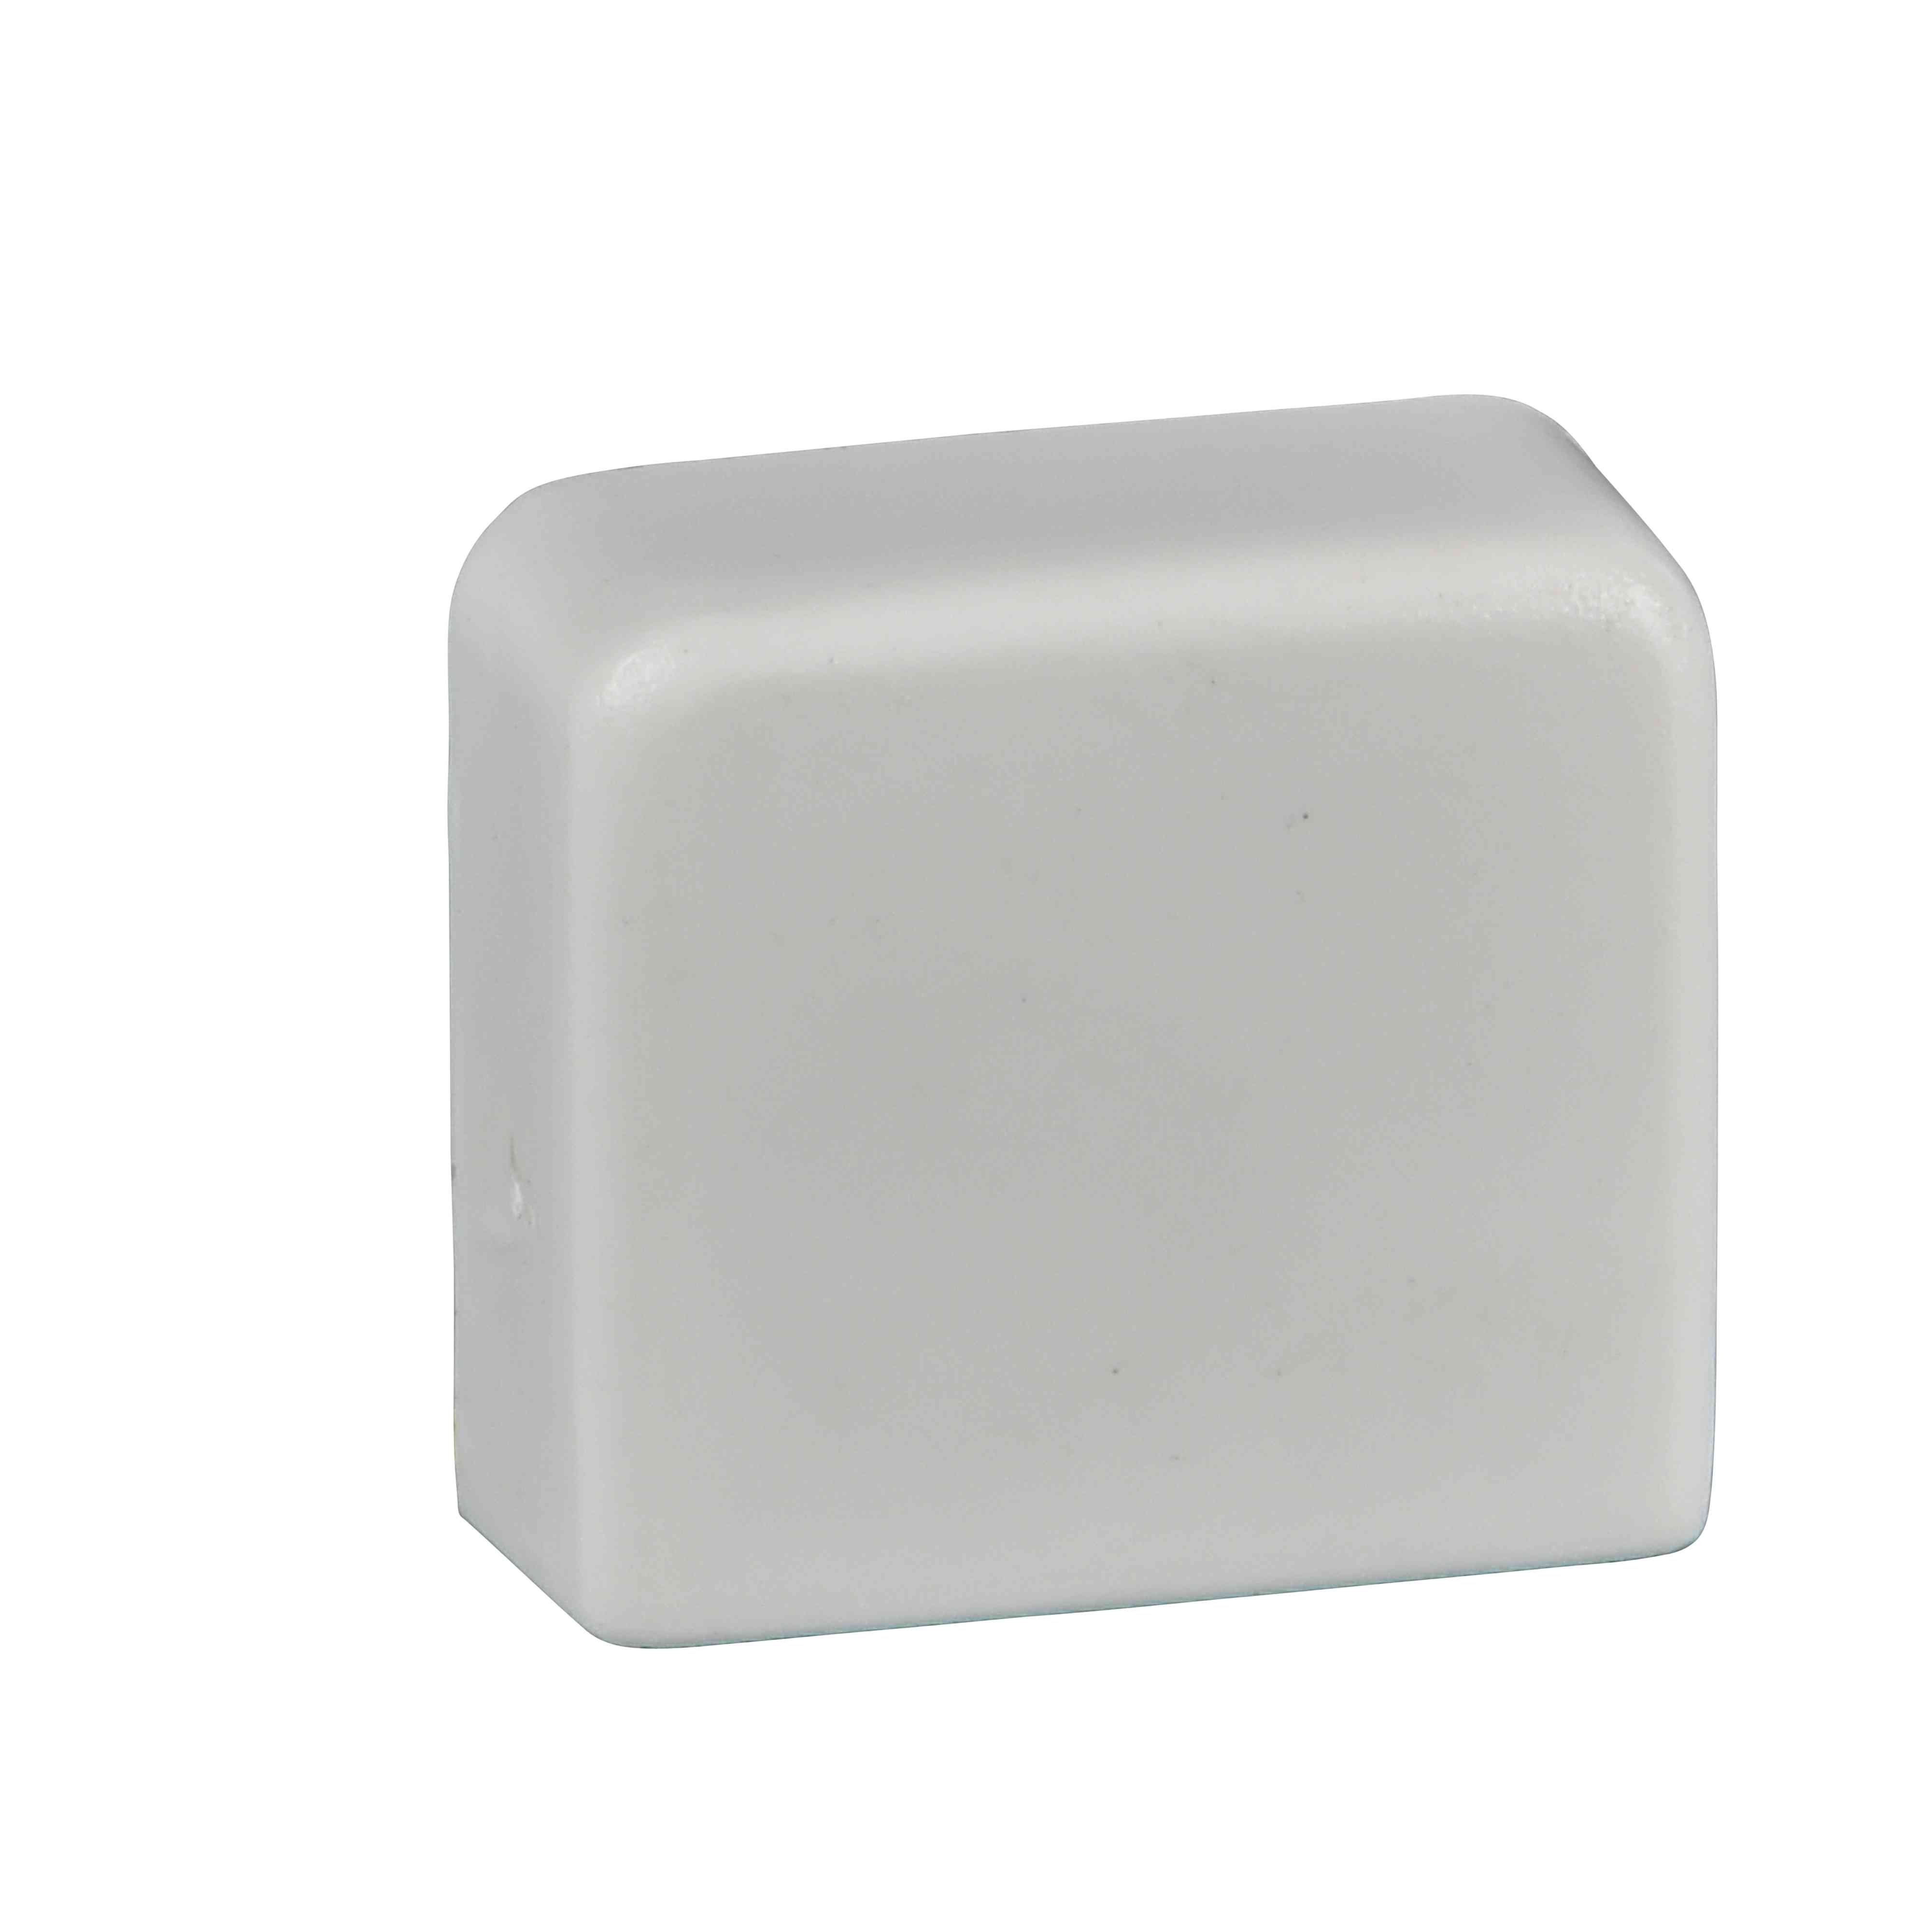 Ultra - stop konec - 21 x 12 mm - ABS - bel